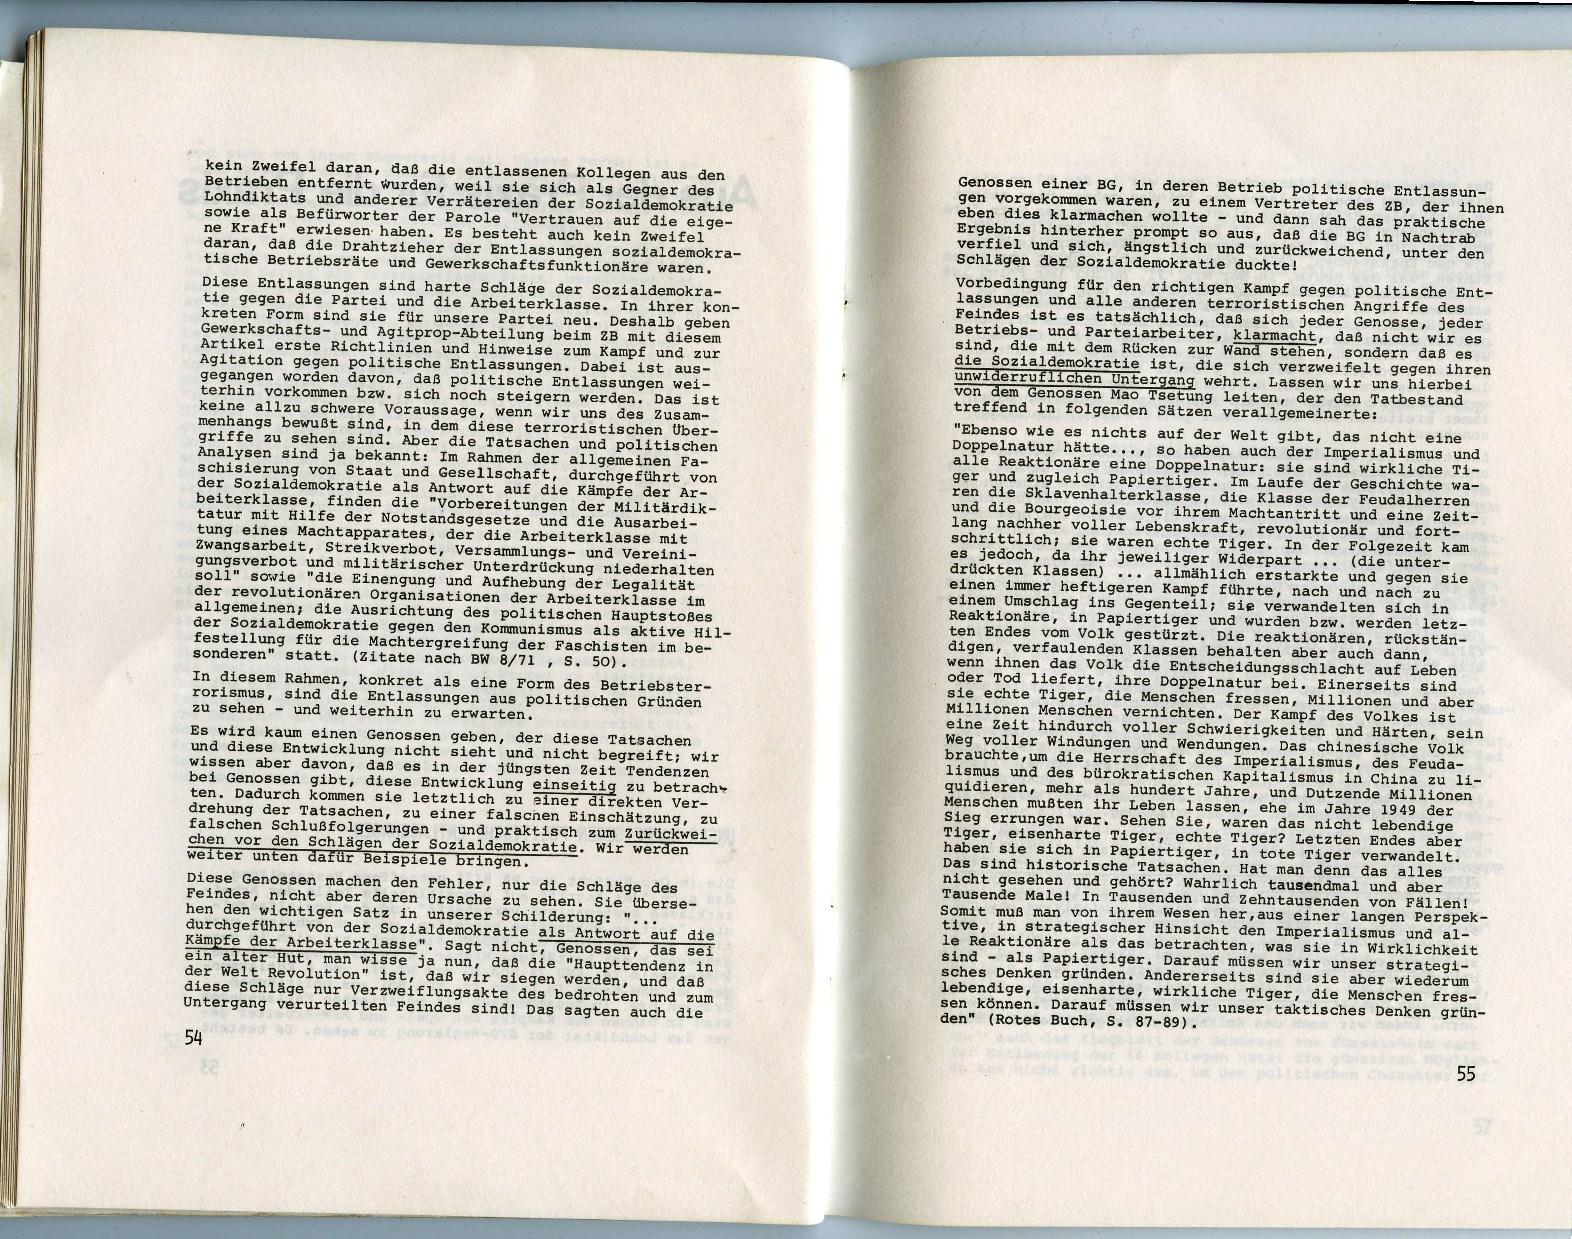 ZB_Parteiarbeiter_1971_09_28